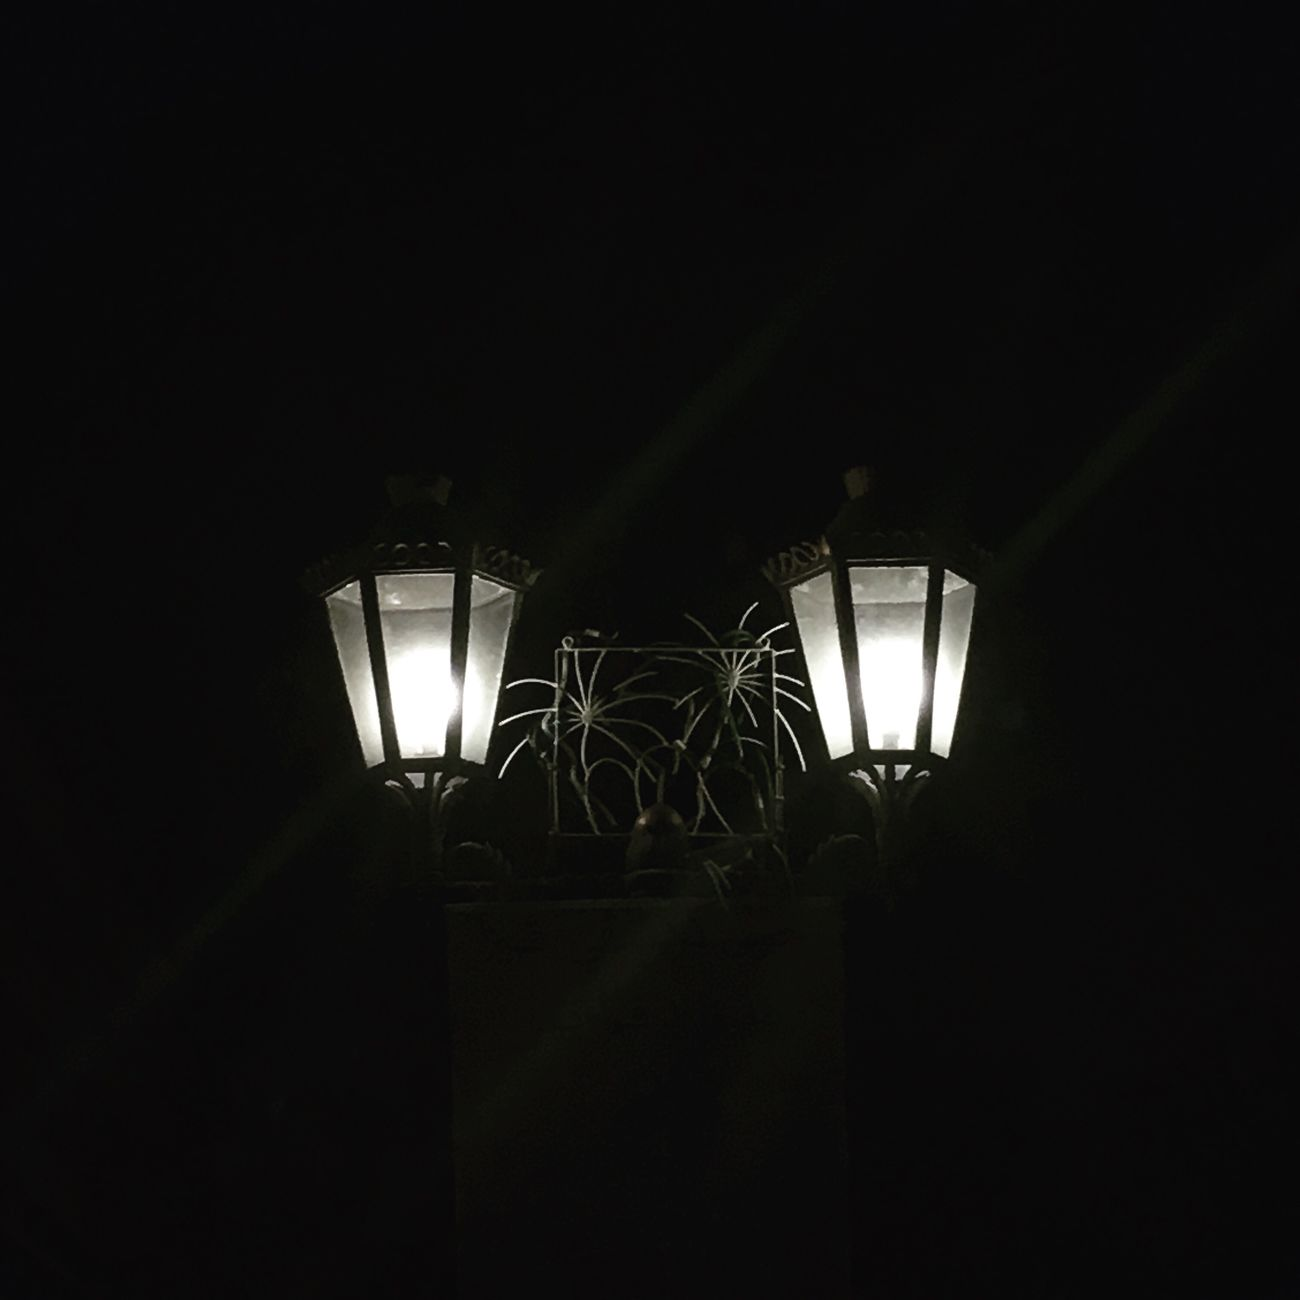 Lamps Lighting Equipment Illuminated Dark Indoors  Night IPhone Photography Brunei Darussalam IPhoneArtism Explore Brunei Travel College Life